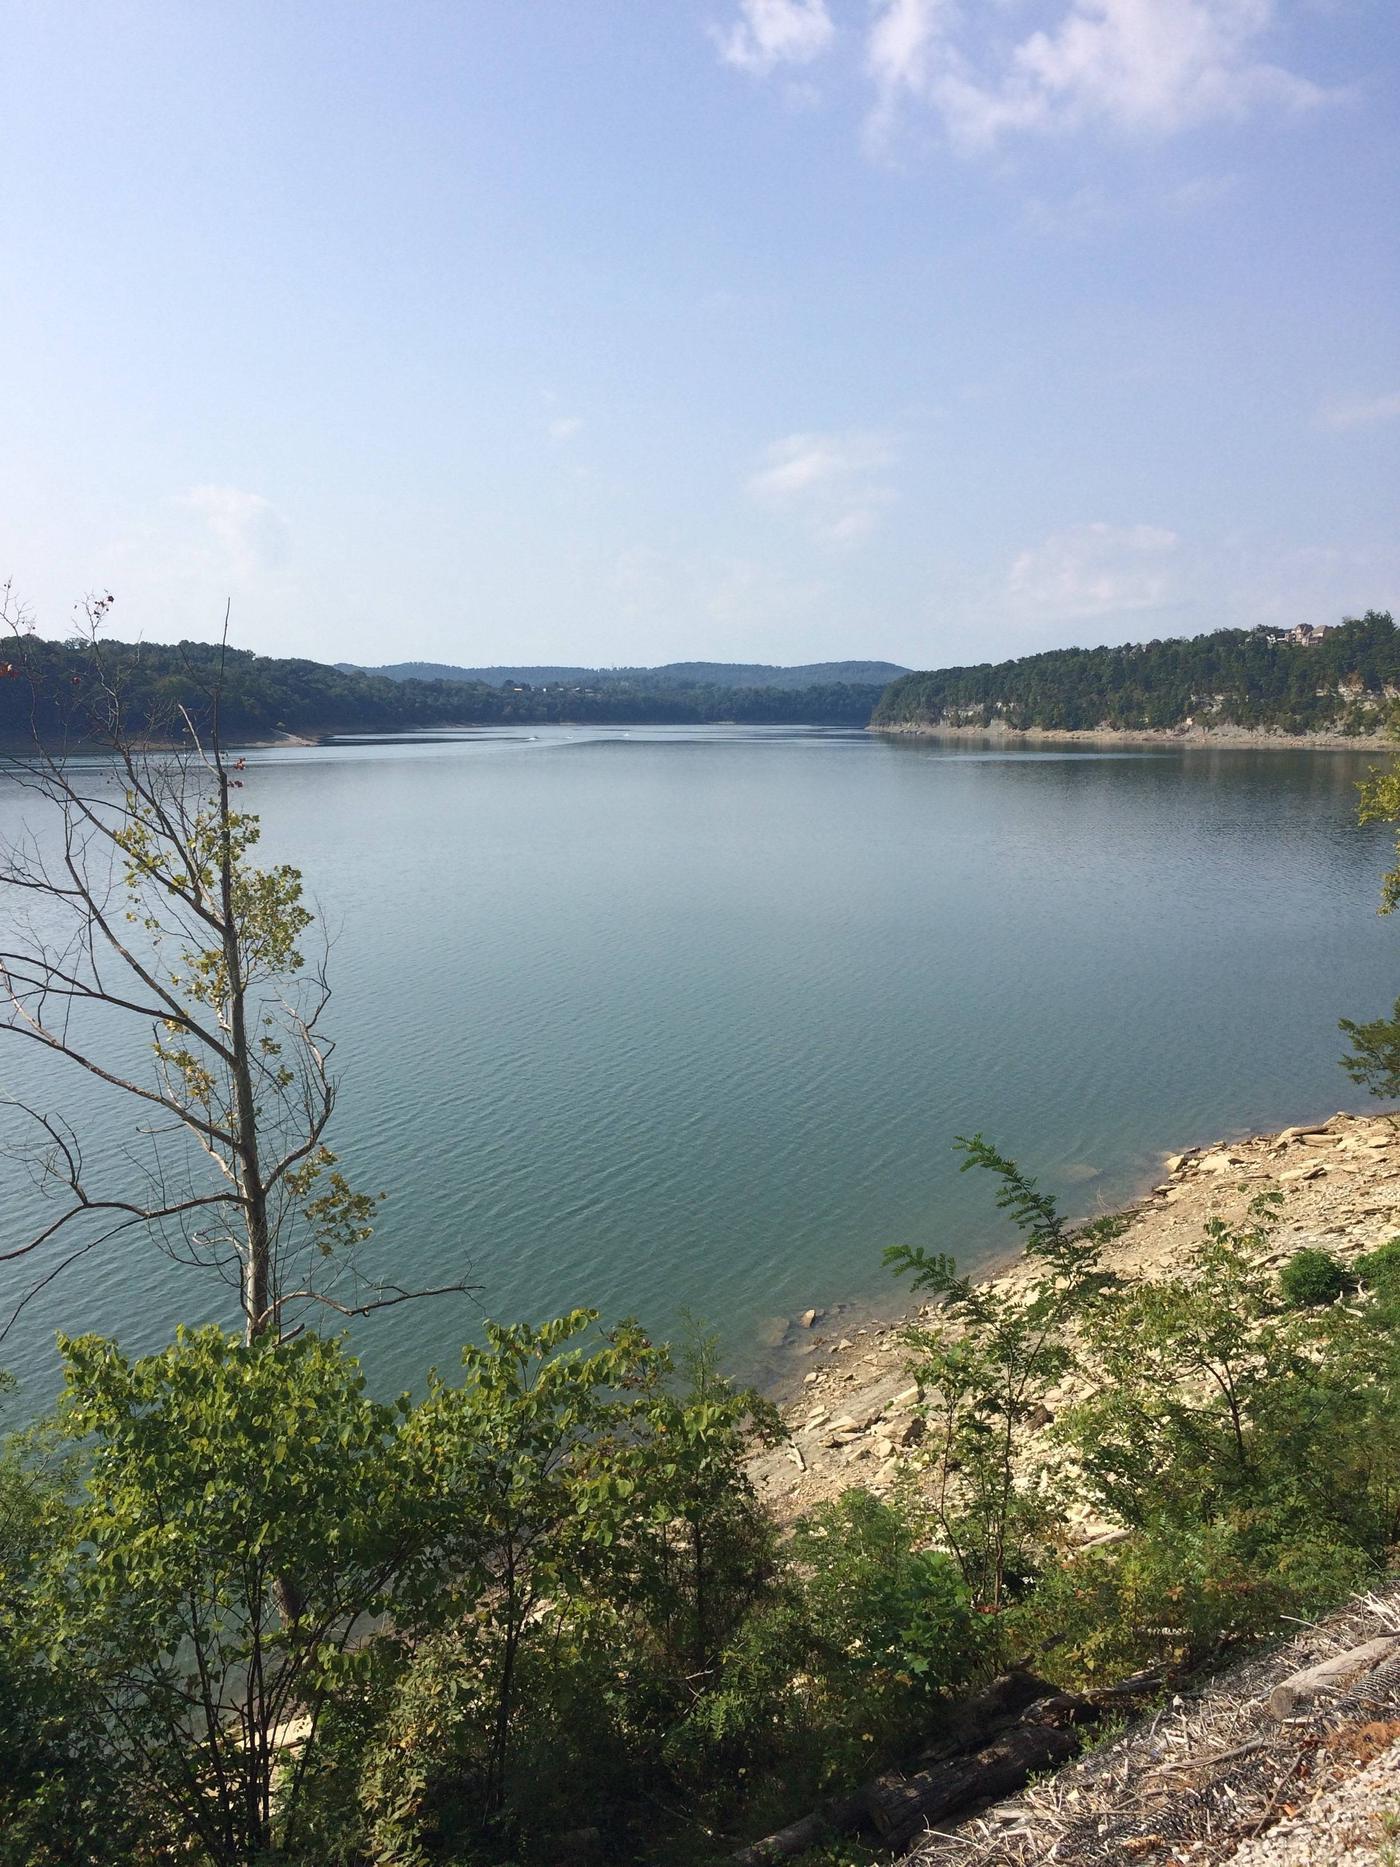 Scenery from campgroundLake Cumberland